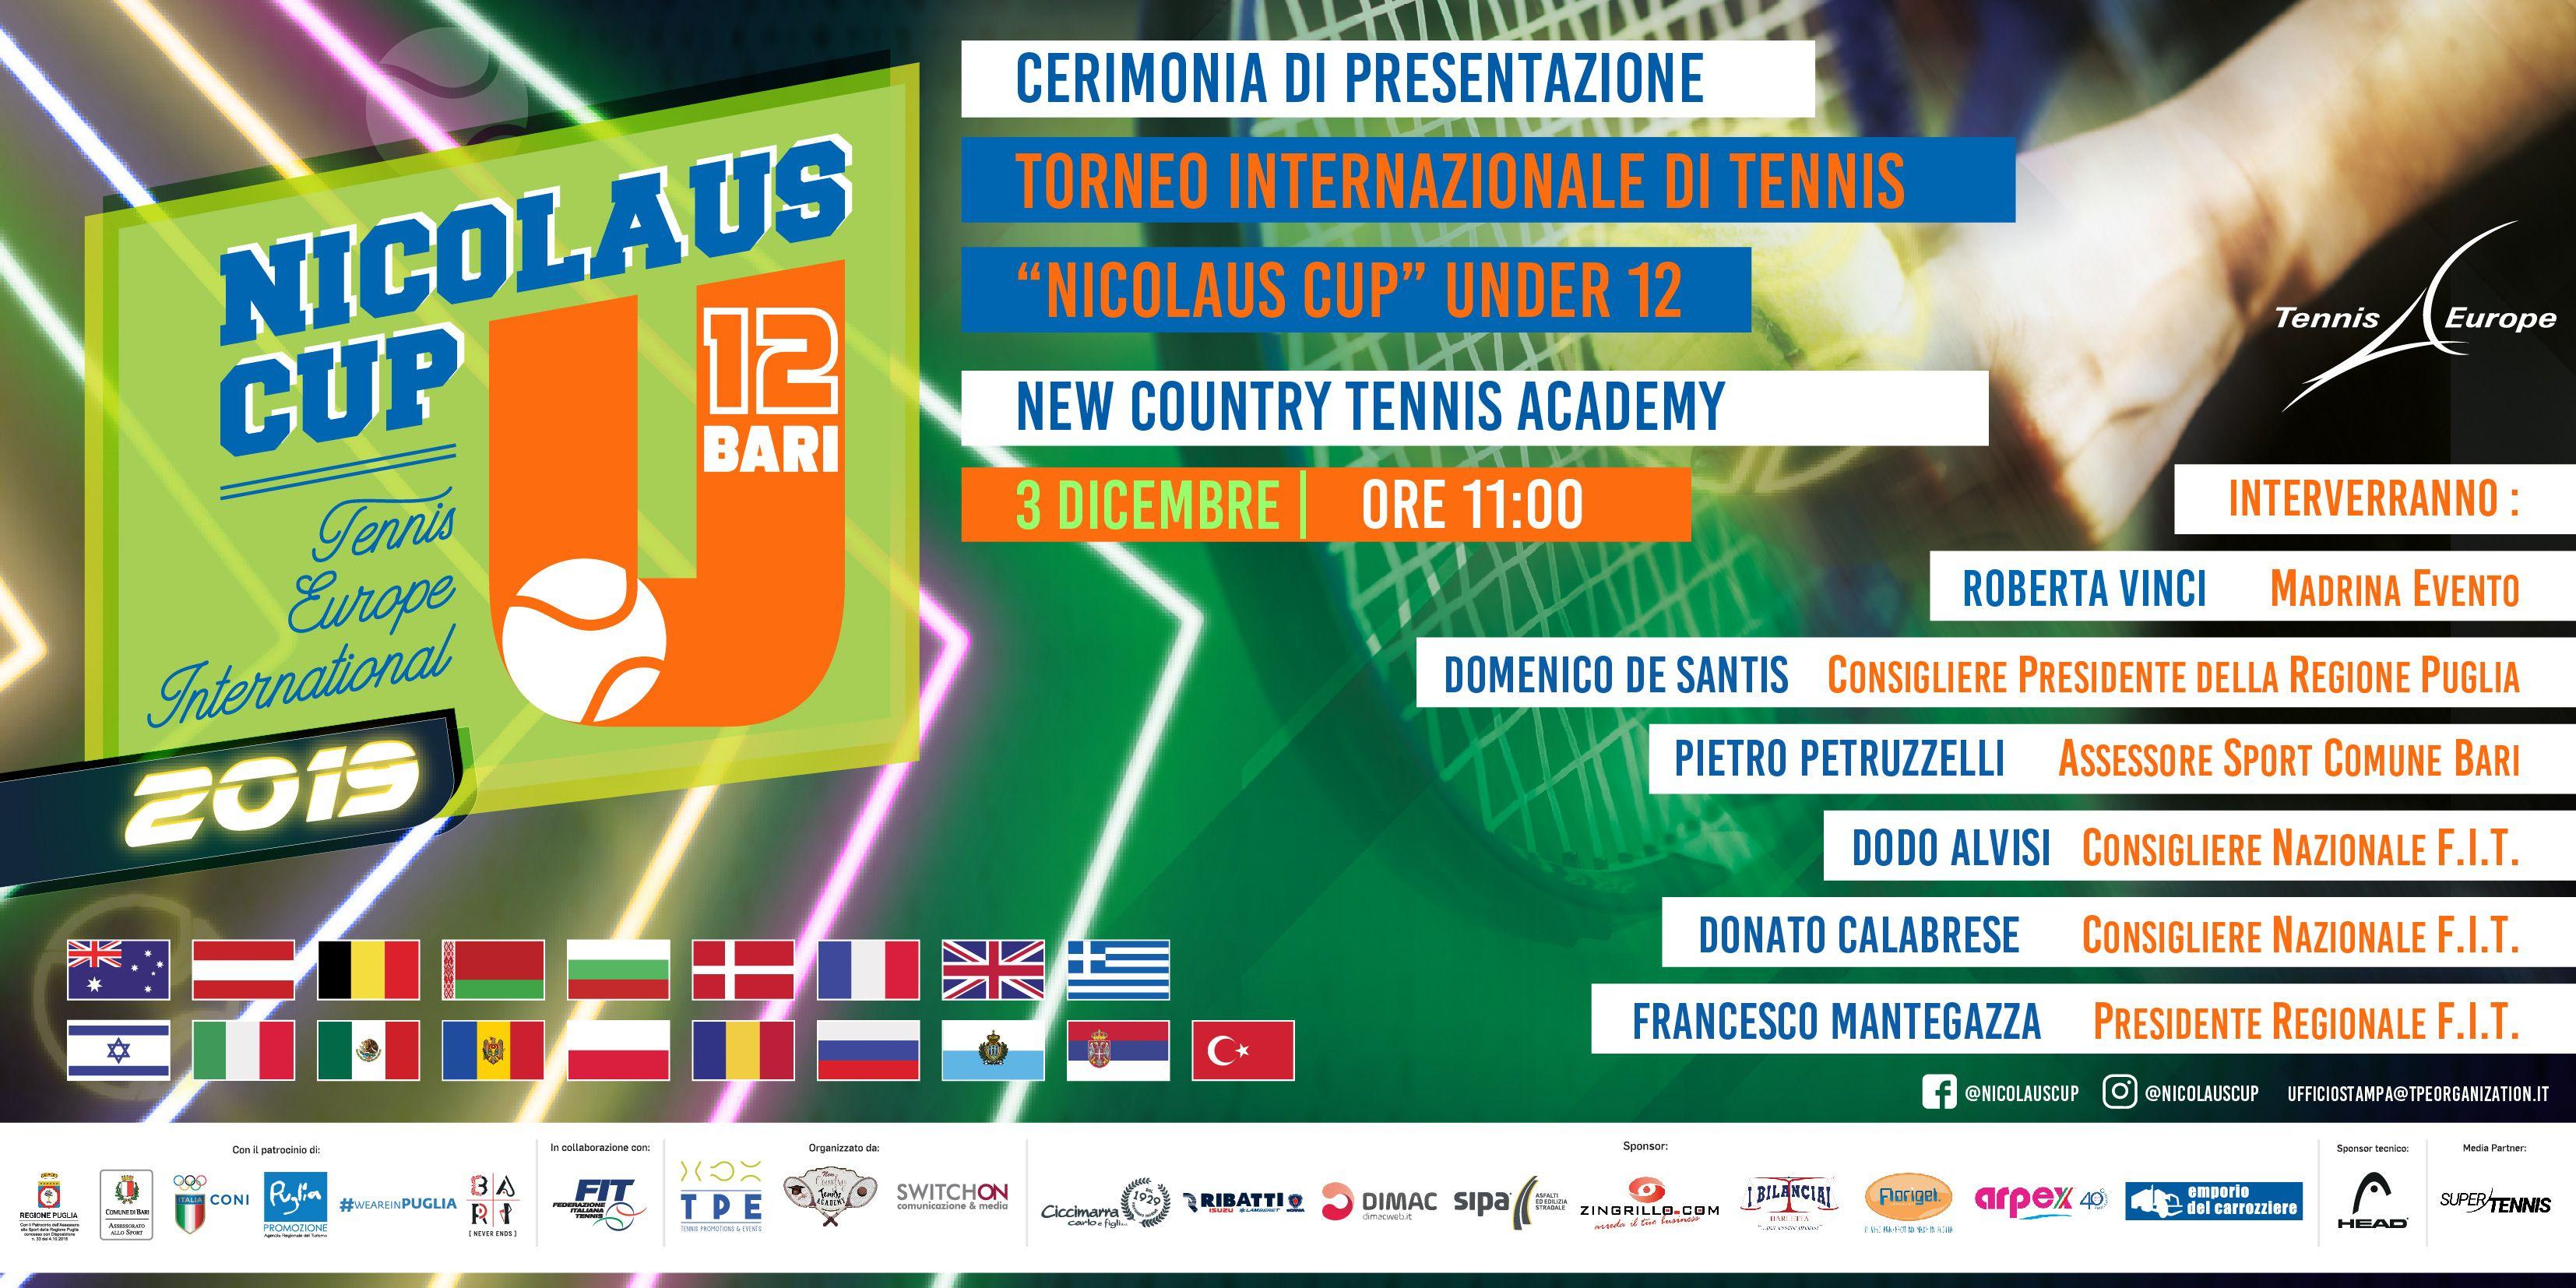 Conferenza stampa di presentazione Nicolaus Cup di tennis.